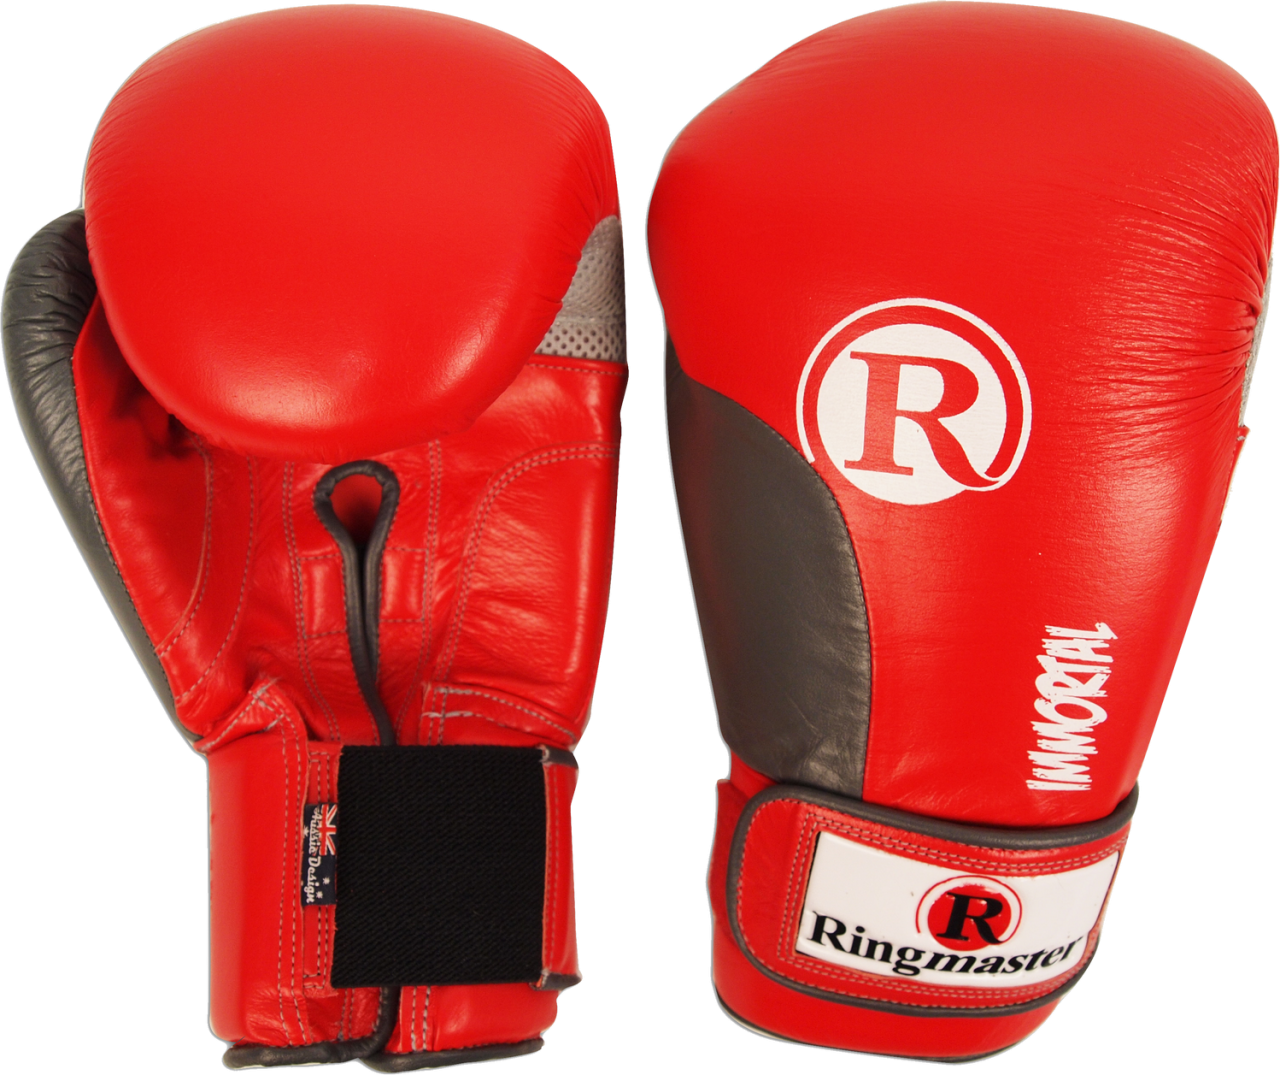 Boxing Glove PNG Image - PurePNG | Free transparent CC0 ...